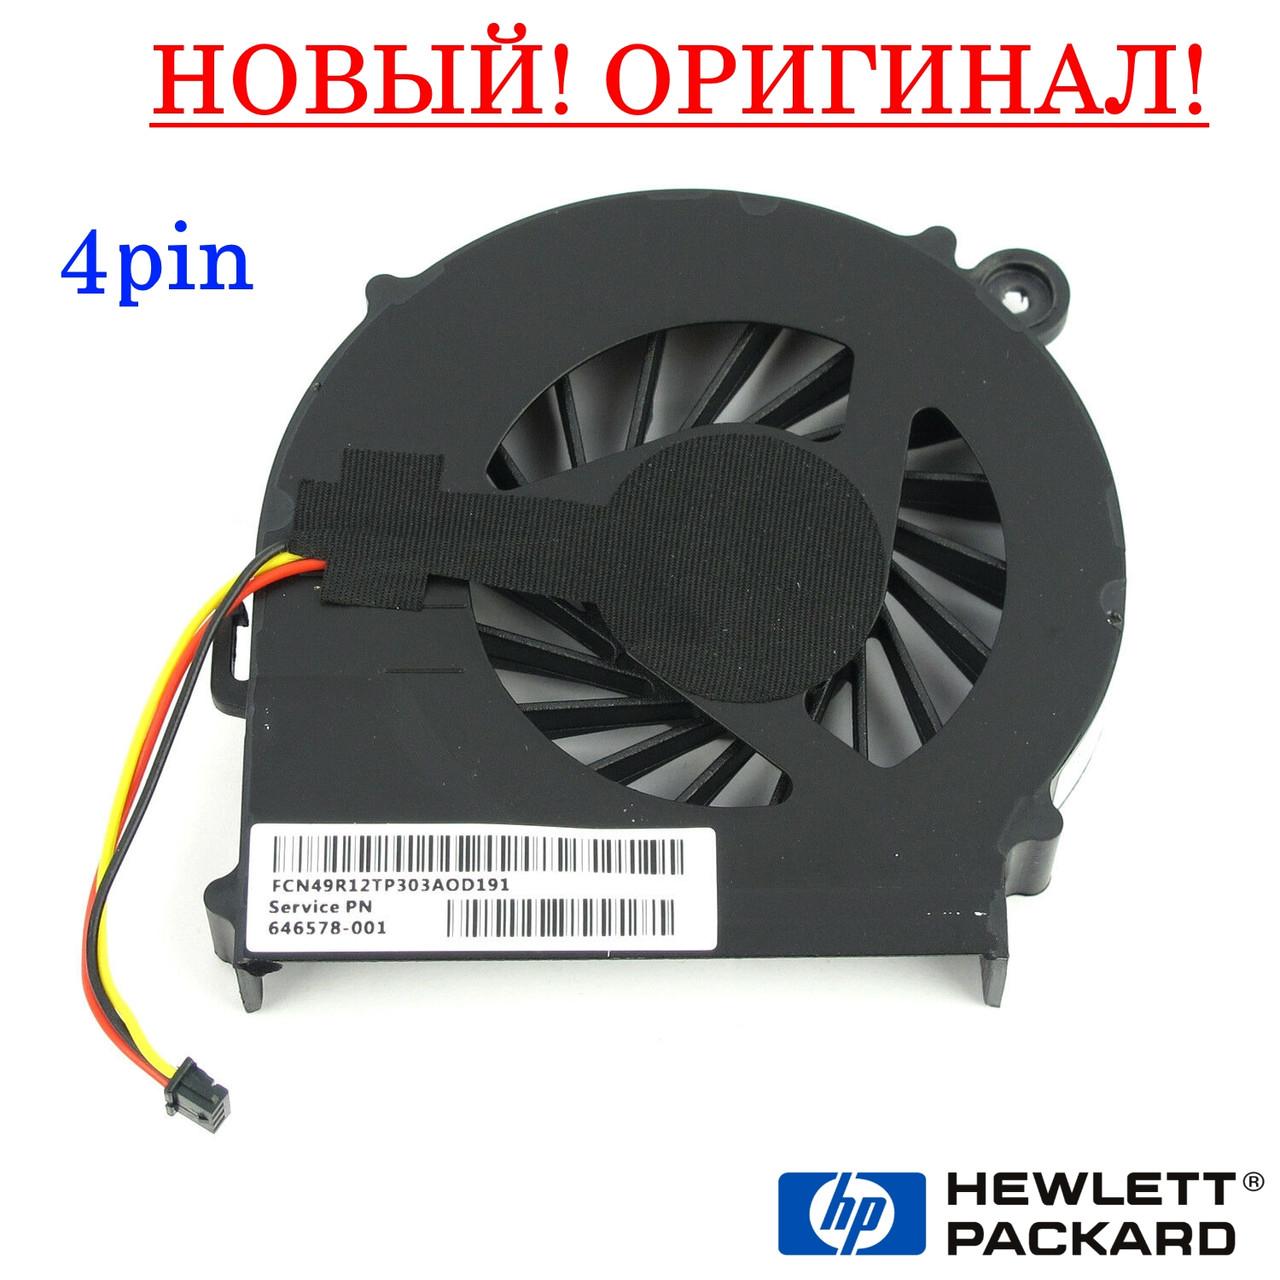 Оригинальный вентилятор кулер FAN для ноутбука HP G6, G6-1000 series (4pin) - 646578-001